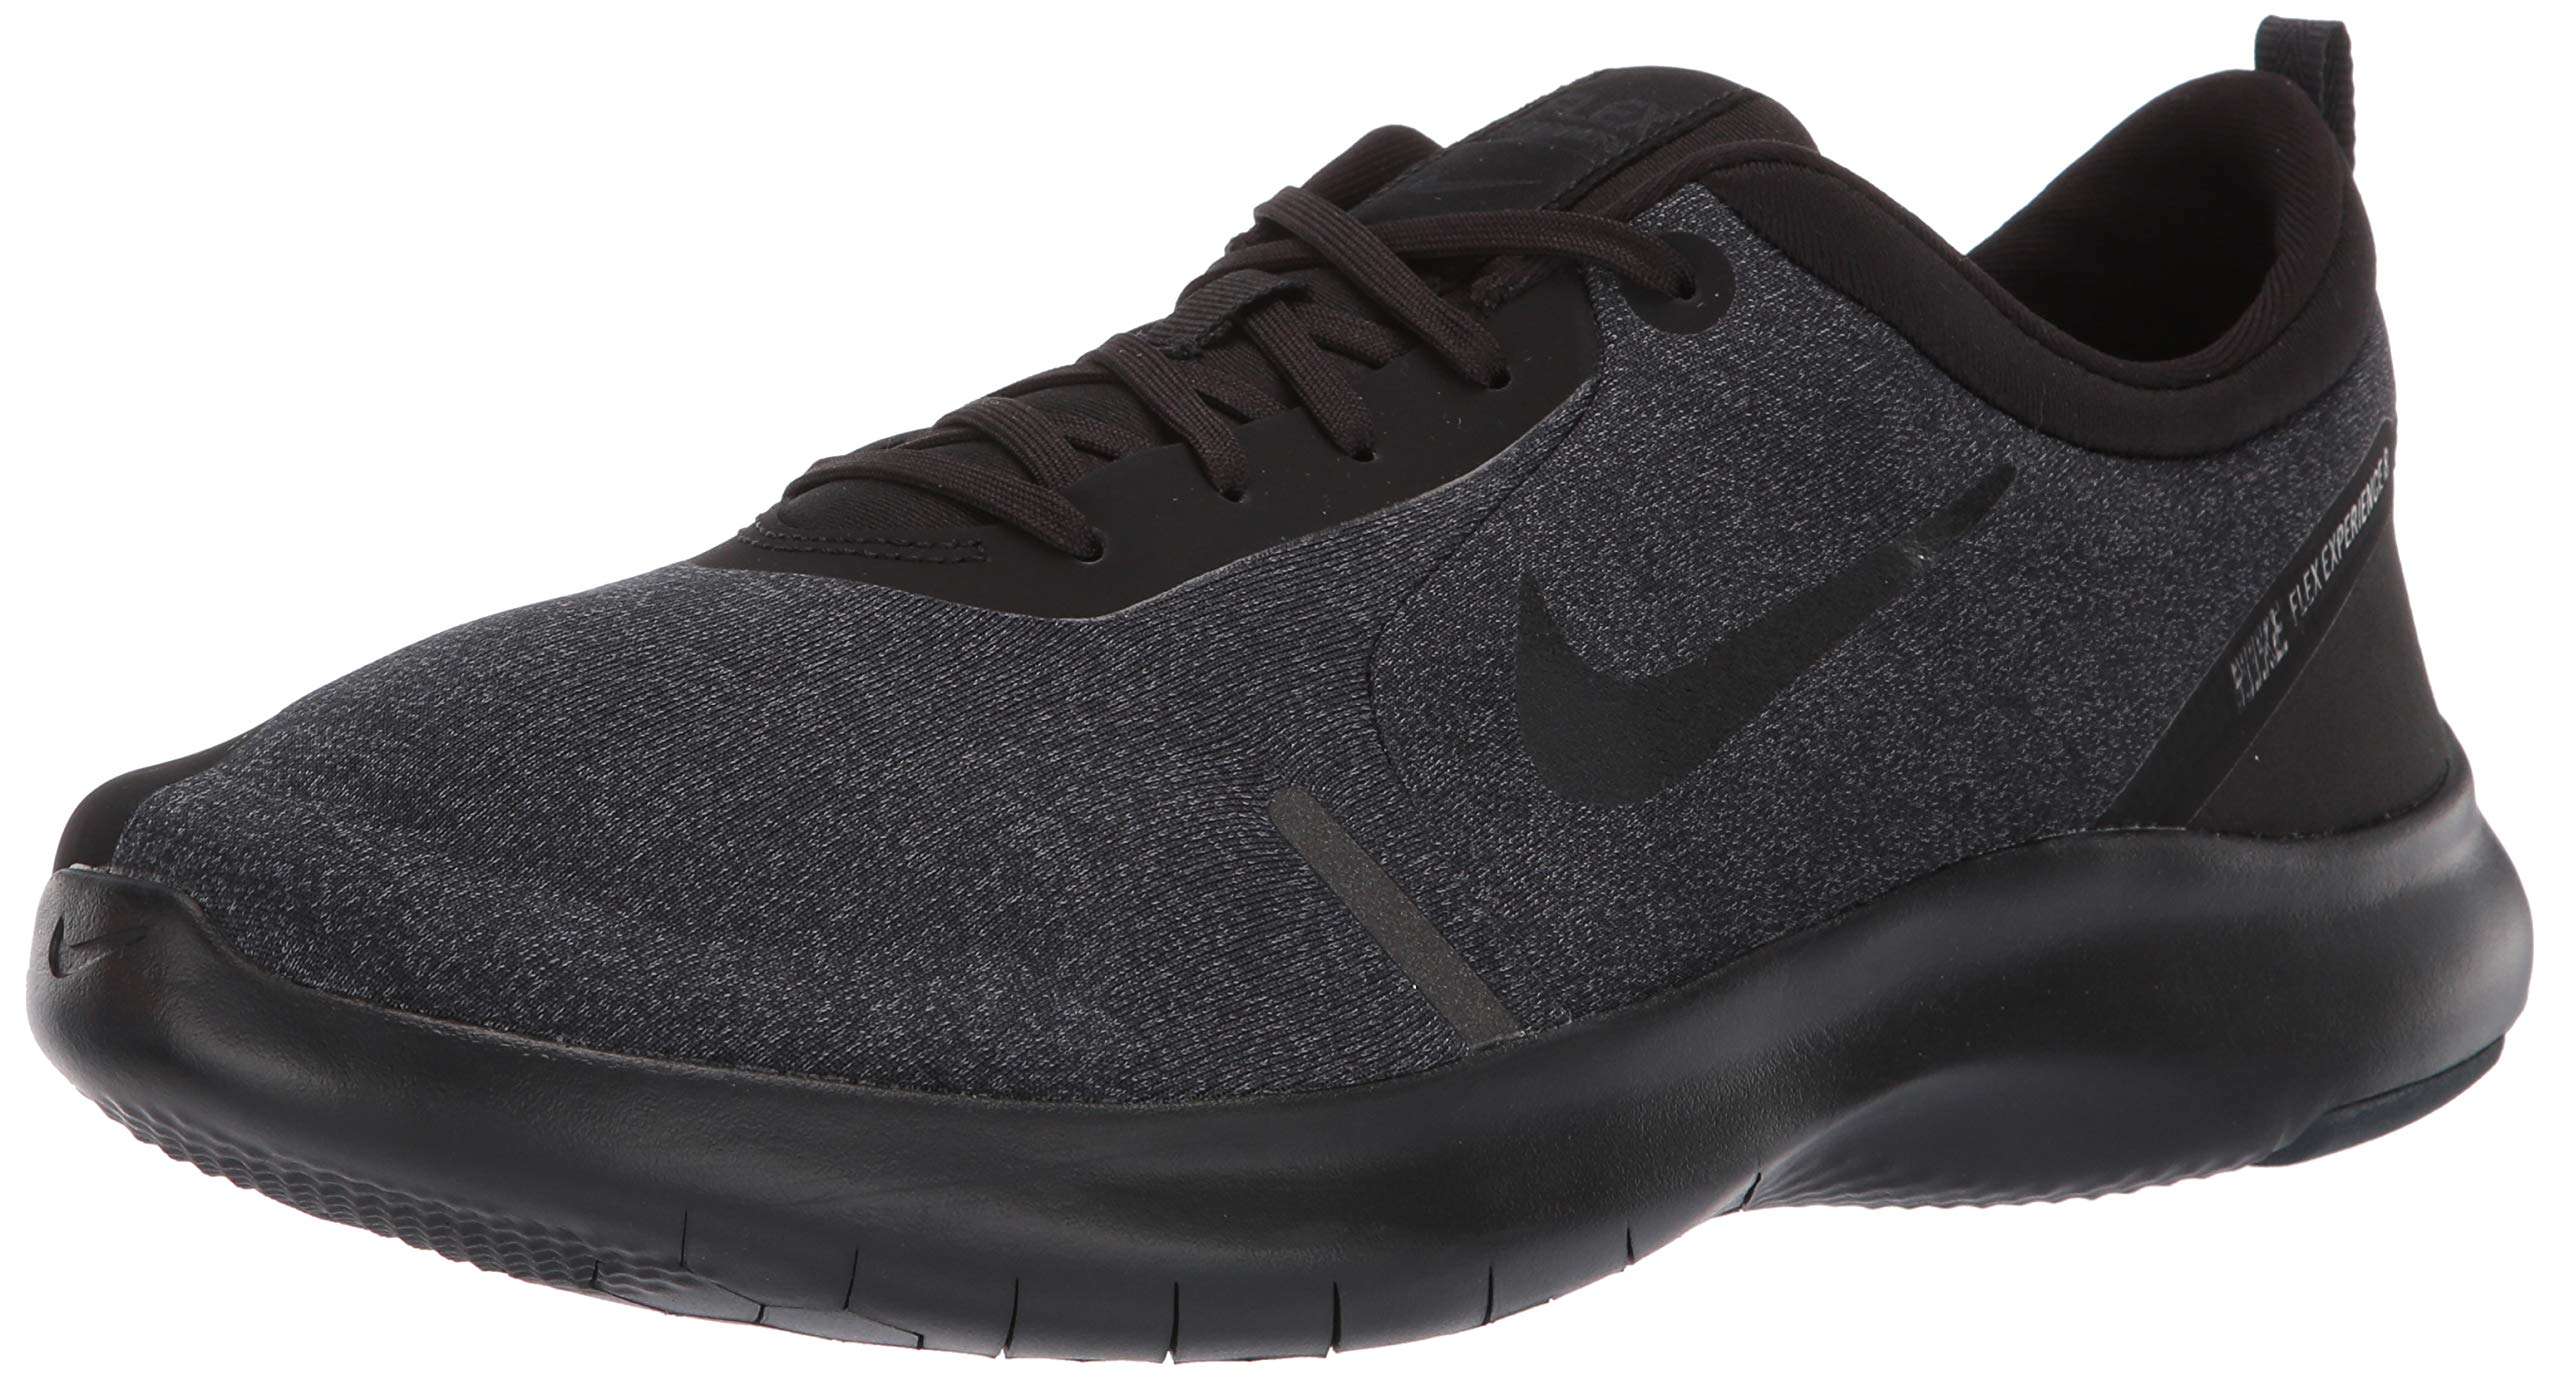 Nike Men's Flex Experience Run 8 Shoe, Black-Anthracite-Dark Grey, 6 4E US